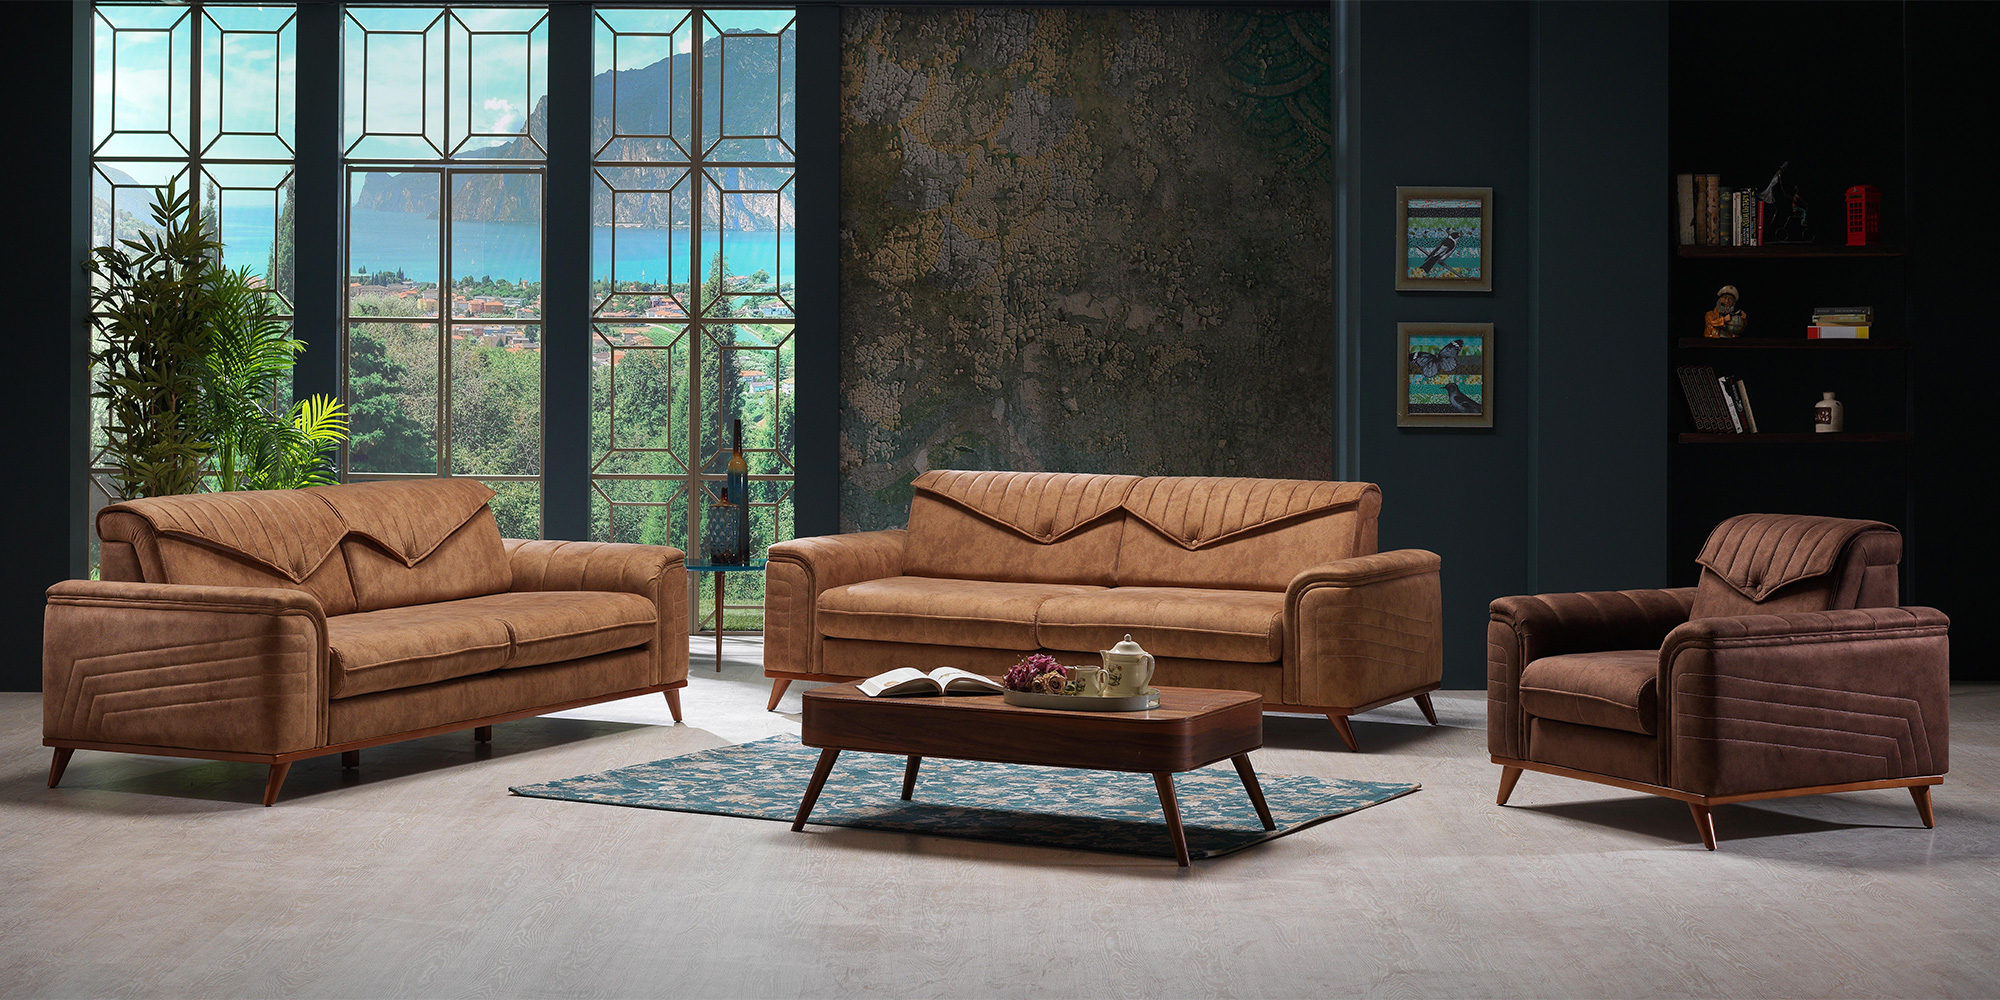 pirizma 3 2 1 sofa set yuvam m belhaus in wuppertal cilek offizieller h ndler in europa. Black Bedroom Furniture Sets. Home Design Ideas